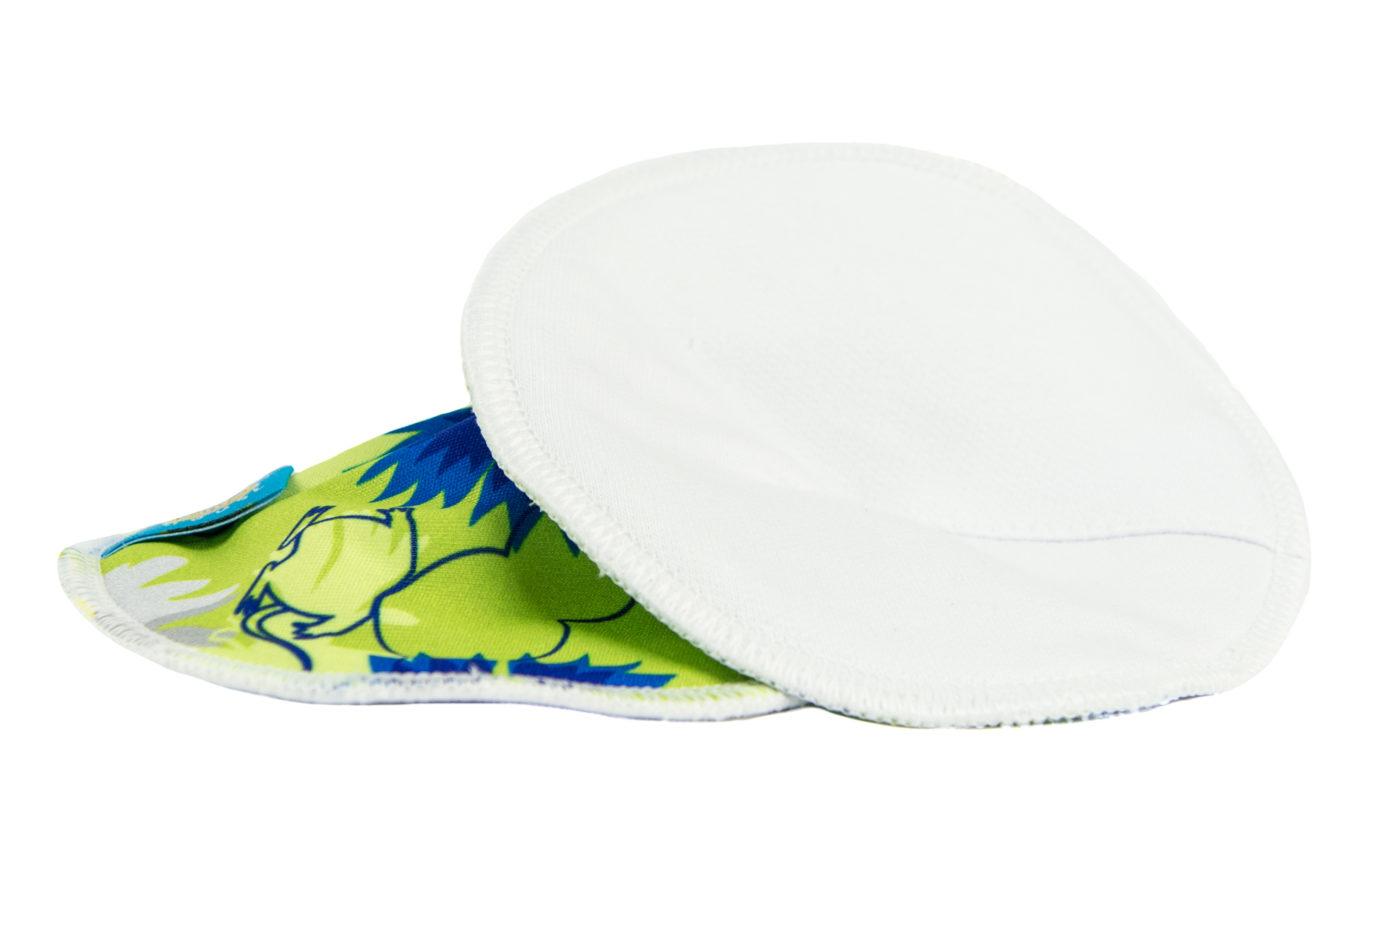 Reusable Nursing Pad (CHABRUSZKA)